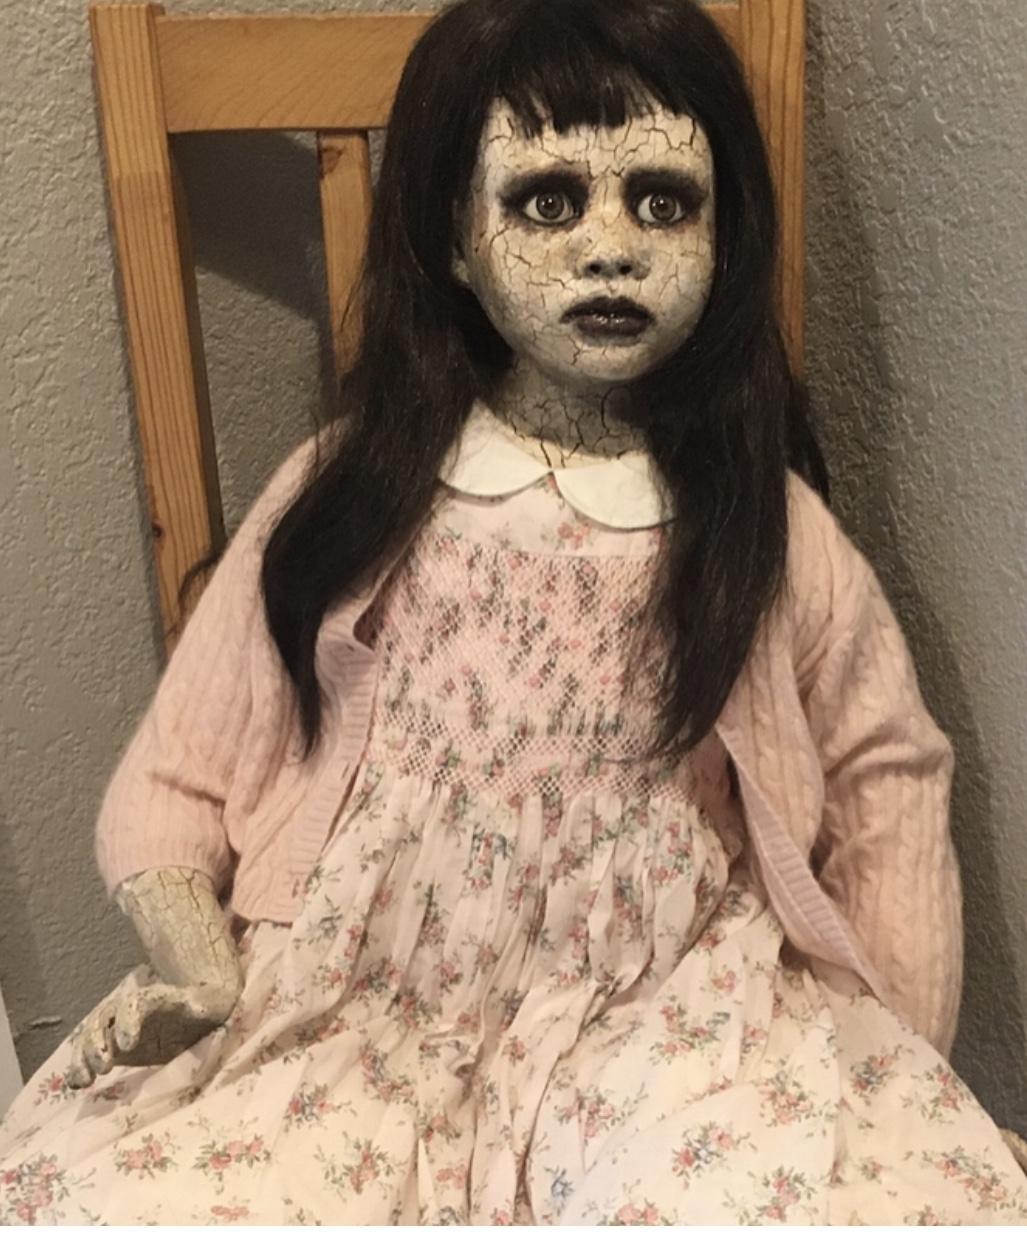 courtesy of  Adopt a Creepy Doll